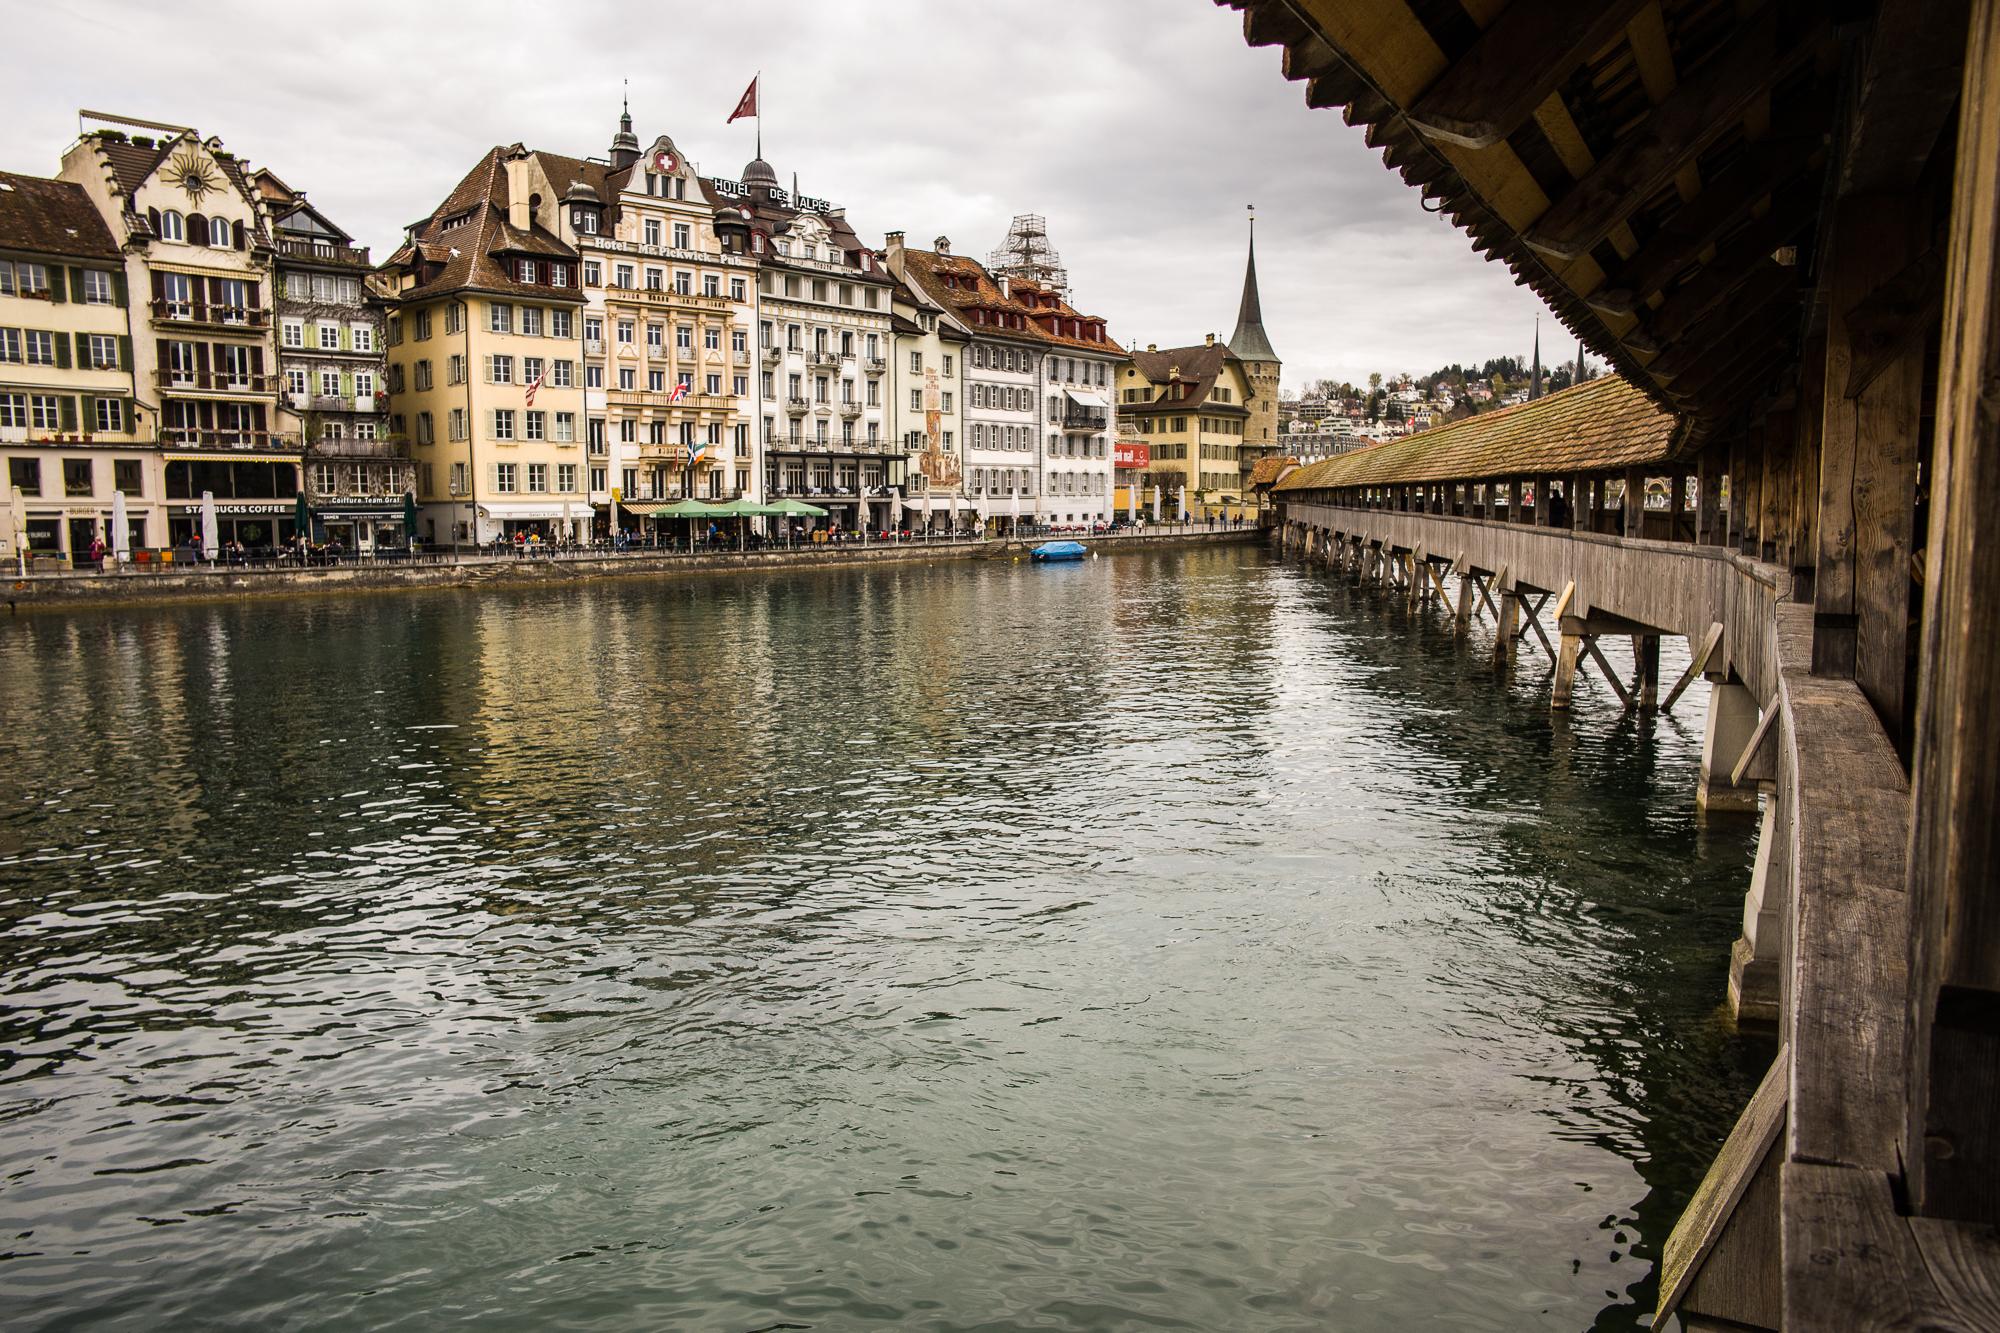 The Kapellbrücke Bridge over the Reuss River in Lucerne